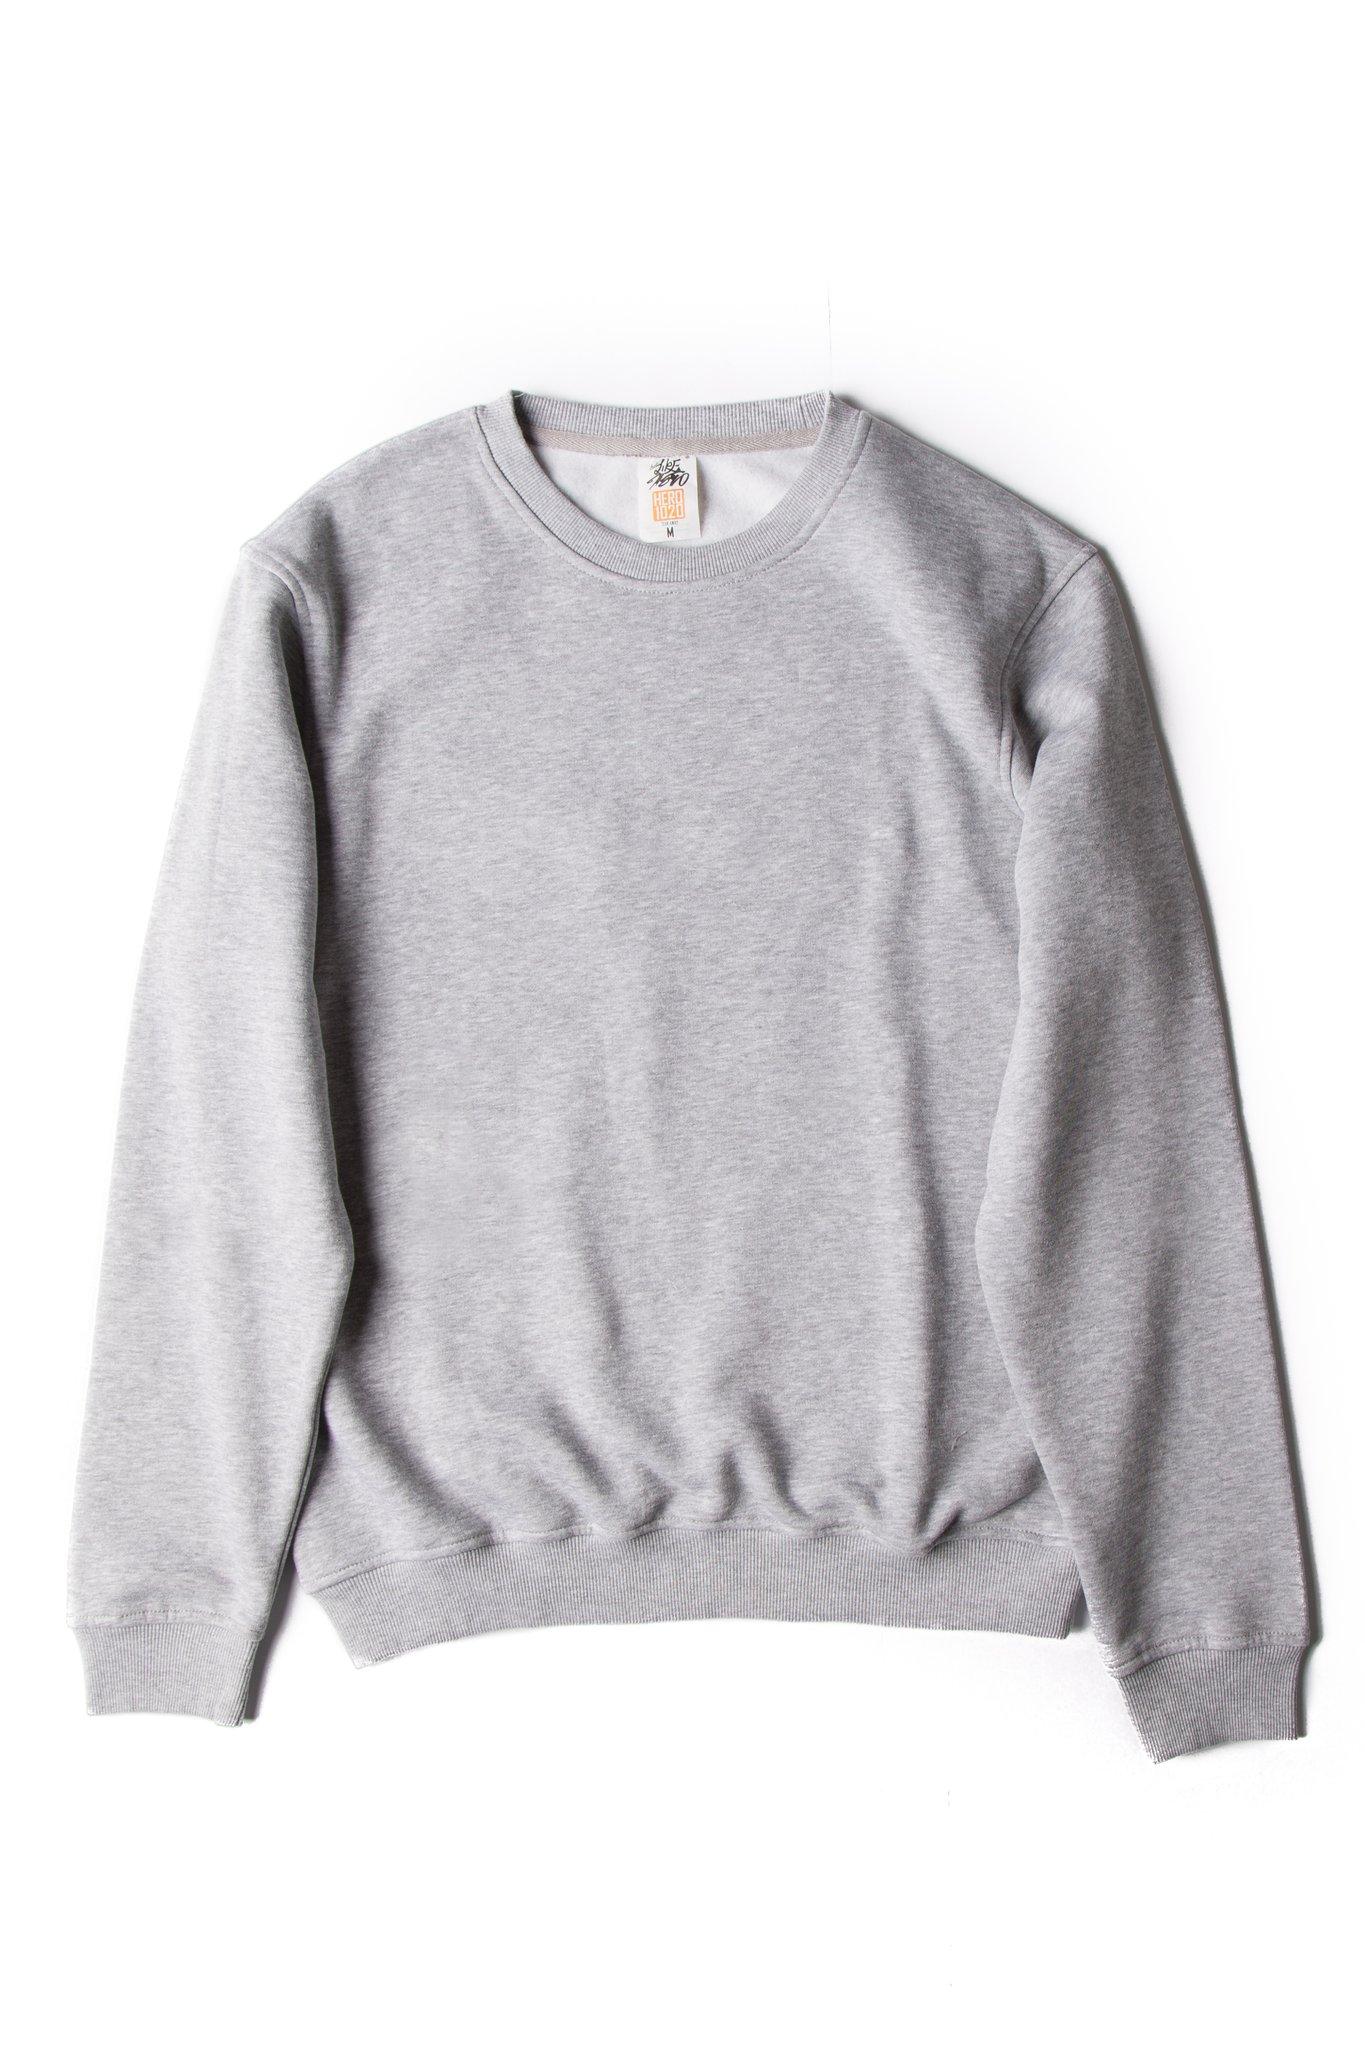 Picture of Unisex Crewneck Sweatshirt